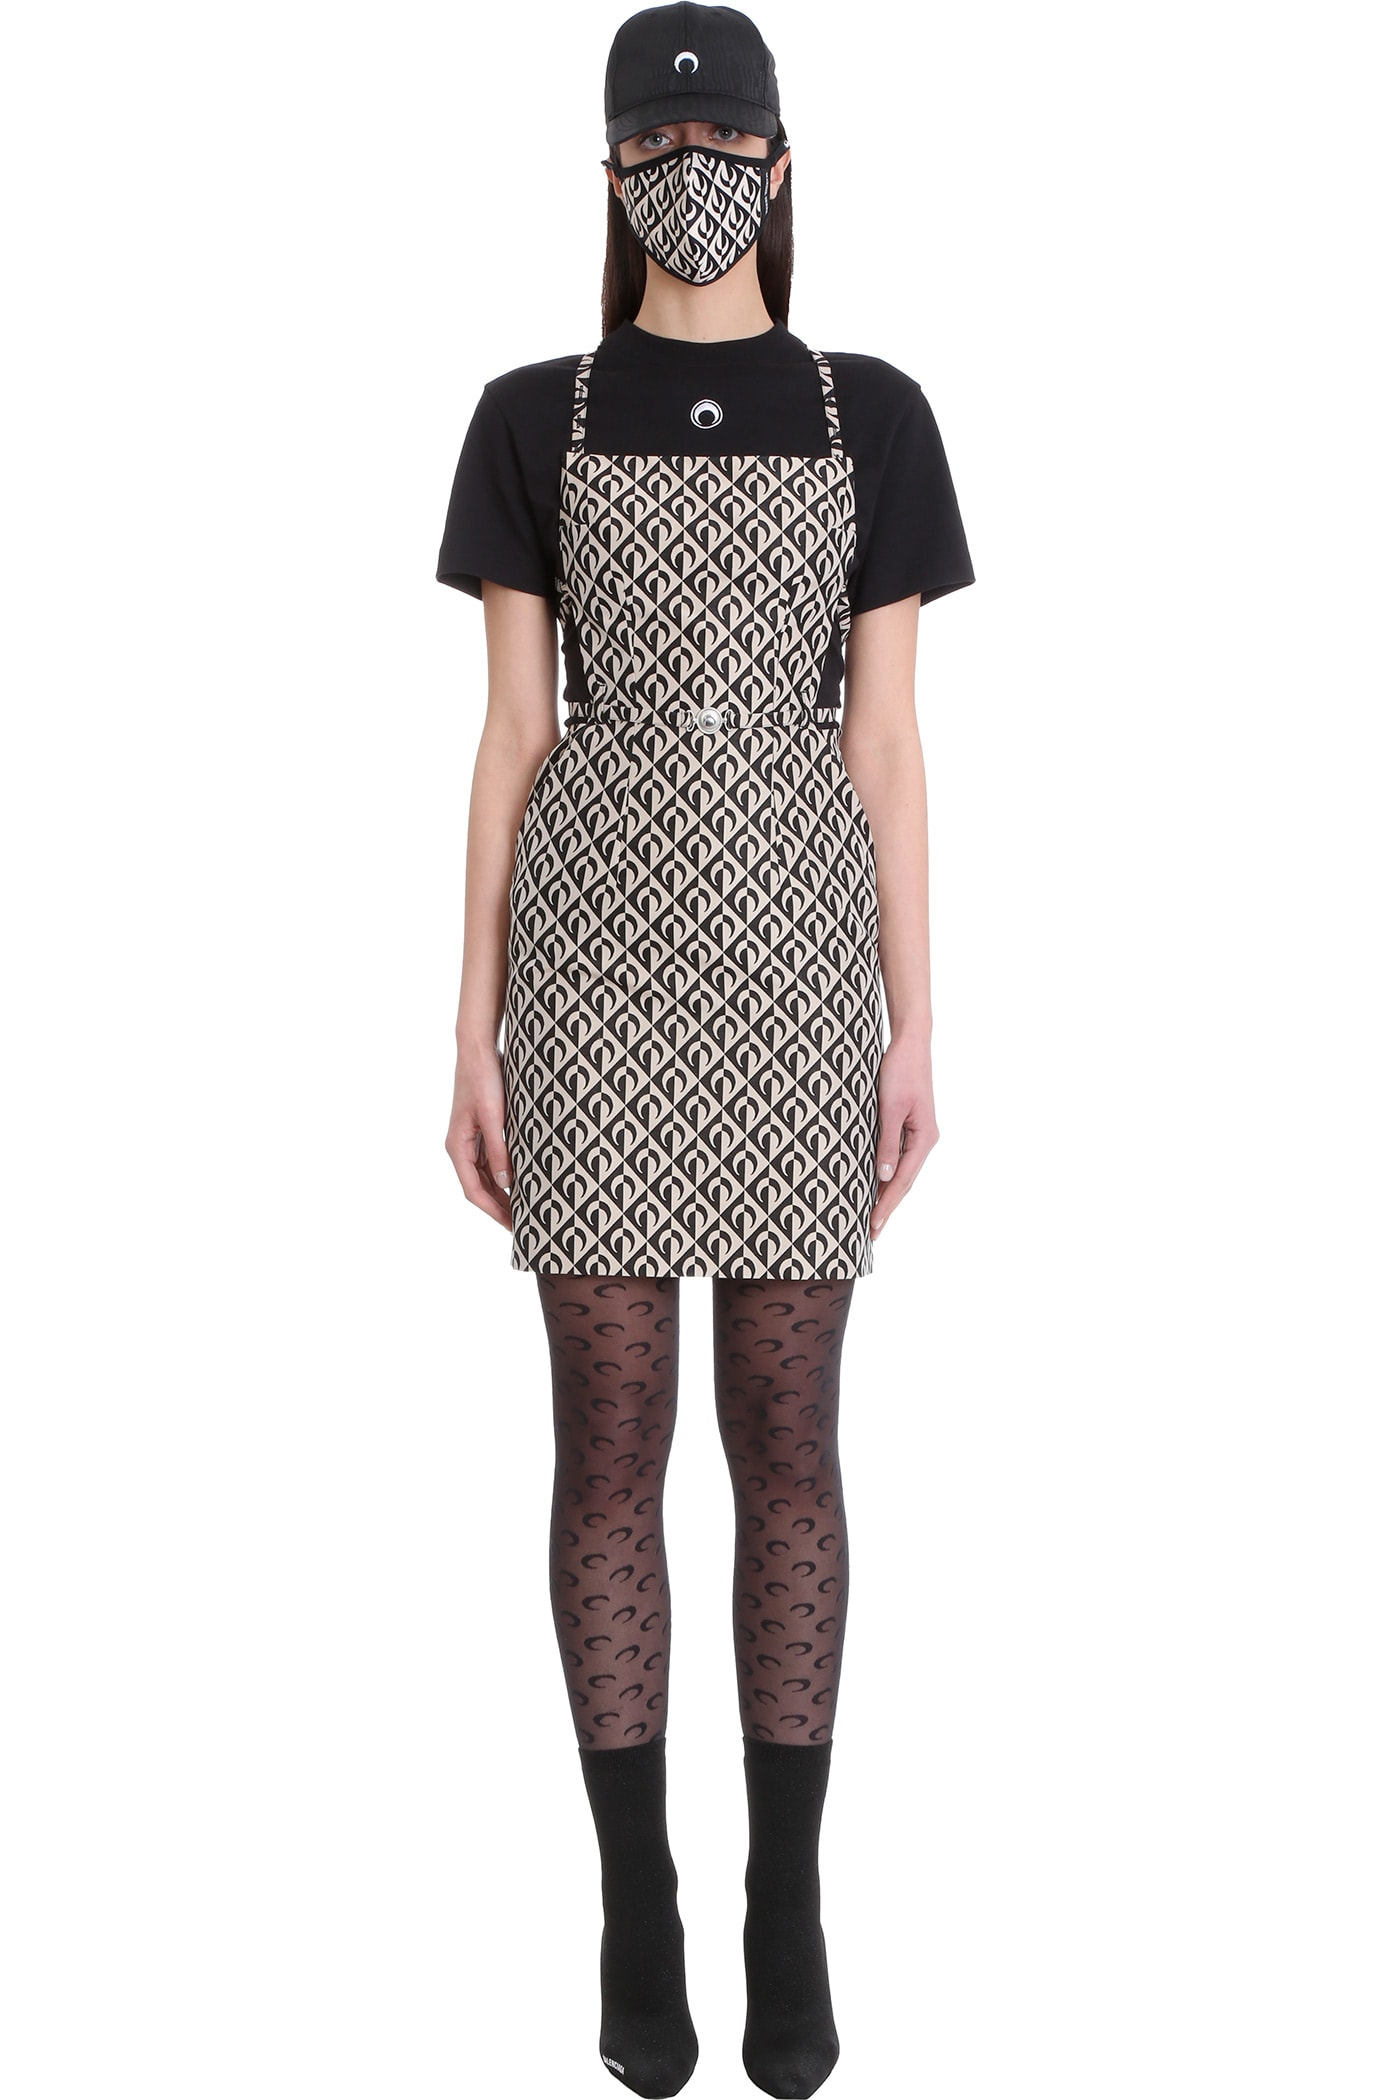 Buy Marine Serre Dress In Beige Cotton online, shop Marine Serre with free shipping